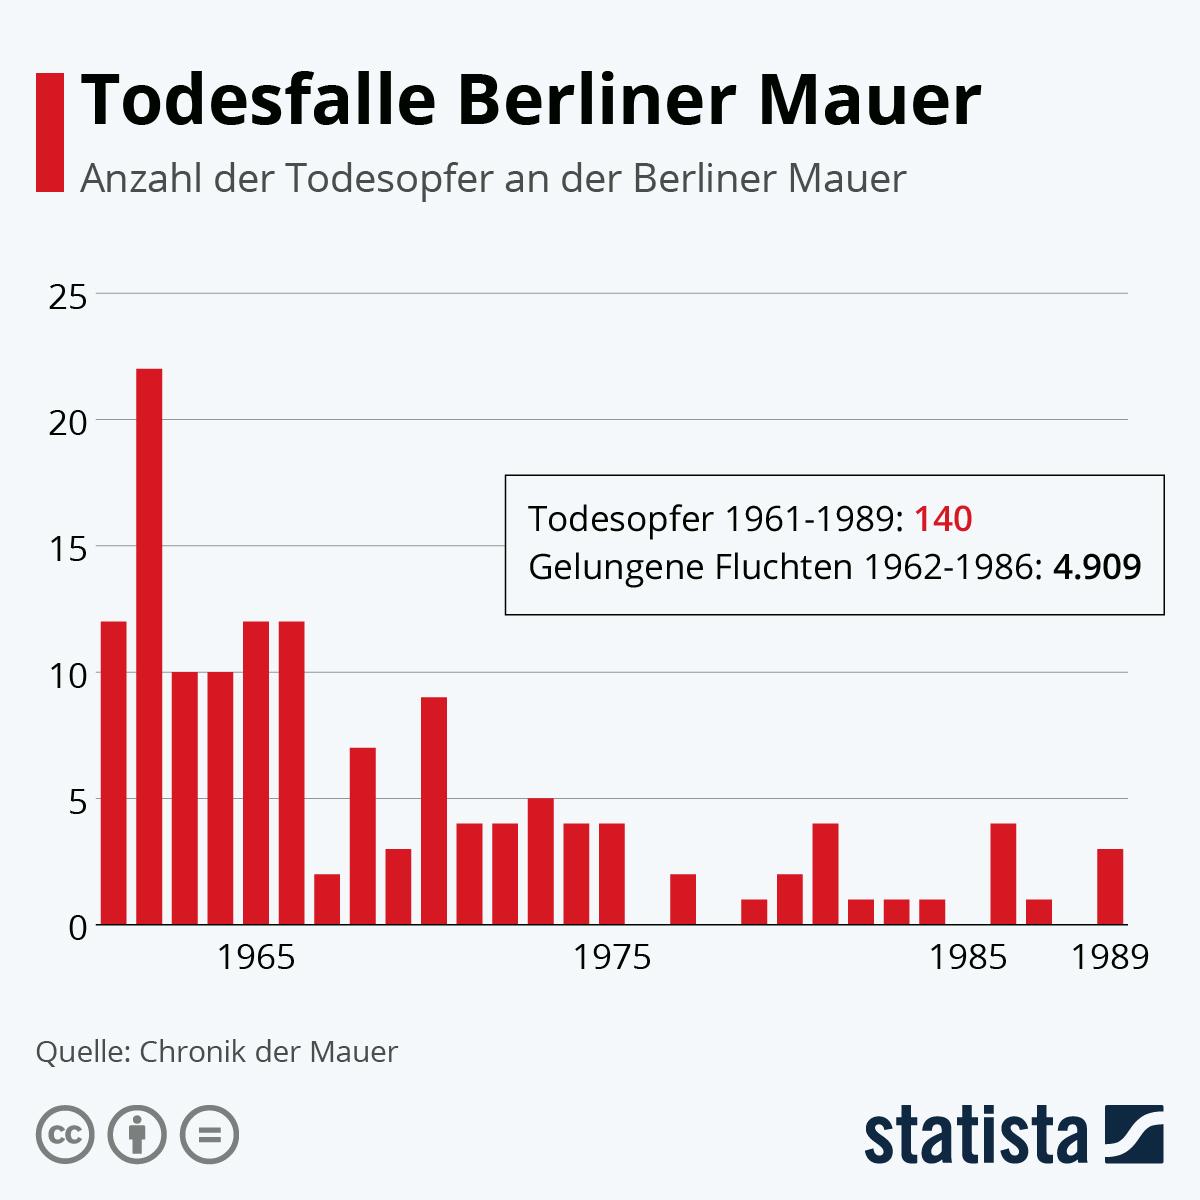 Infografik: Todesfalle Berliner Mauer | Statista